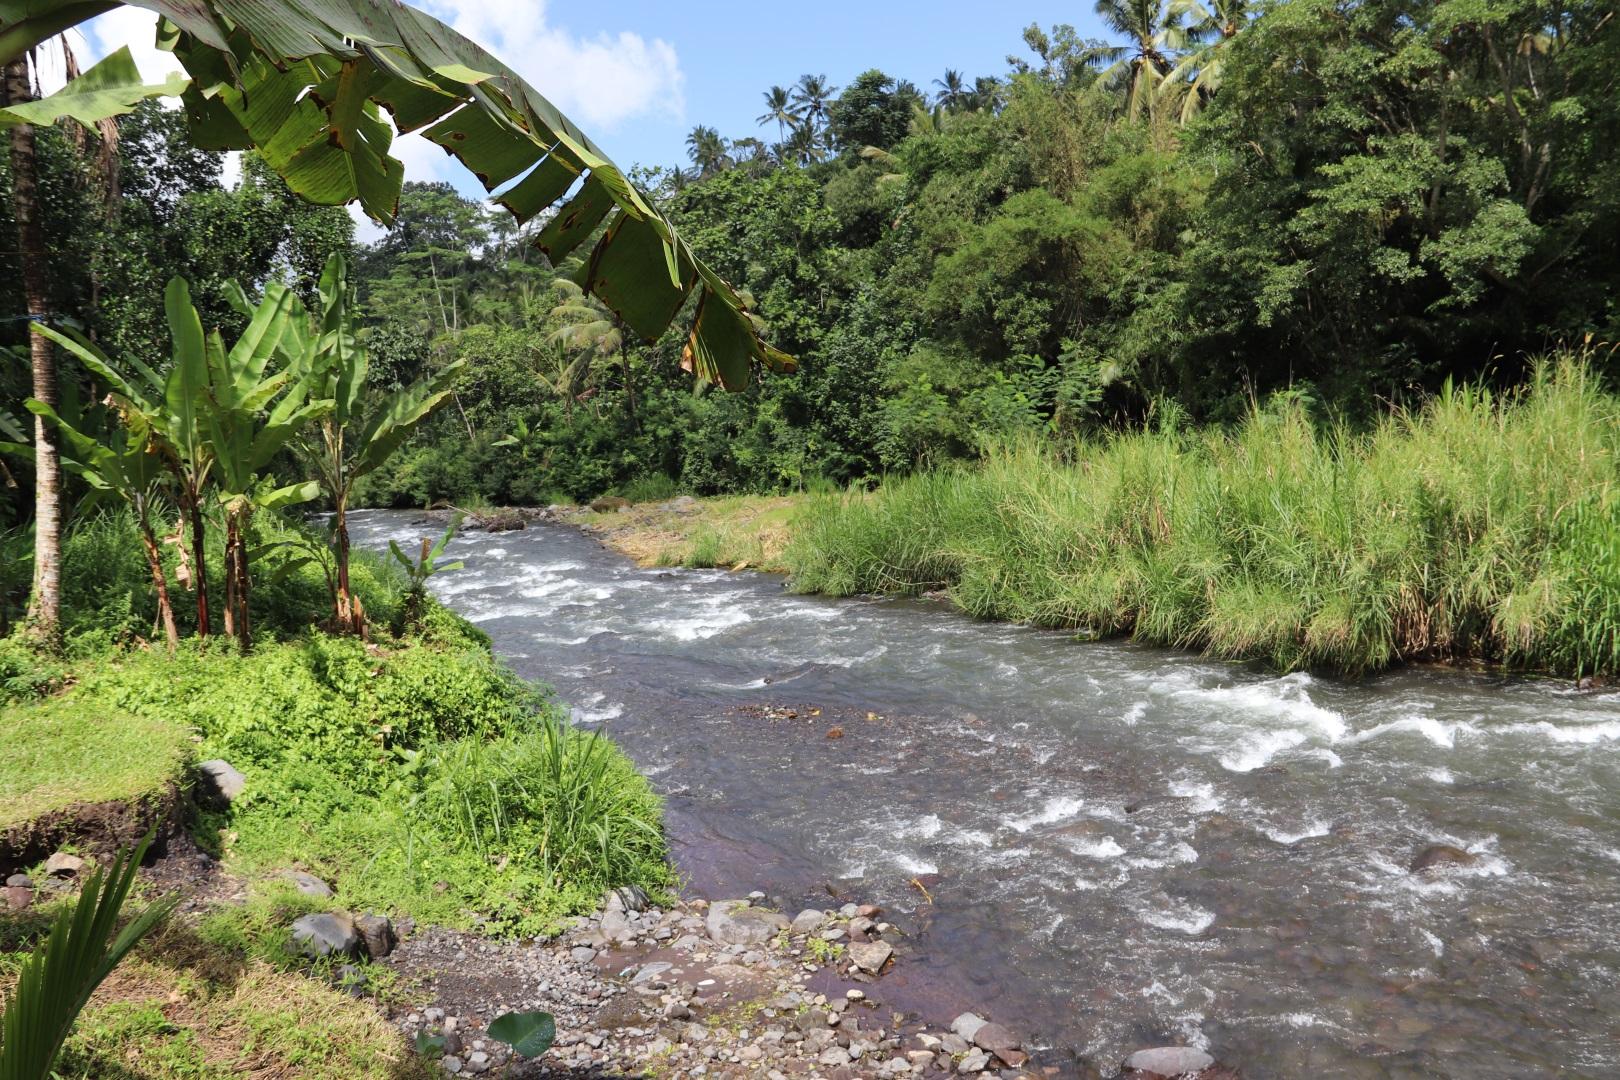 Visiter Les rapides de Telaga Waja en rafting - Indonesie